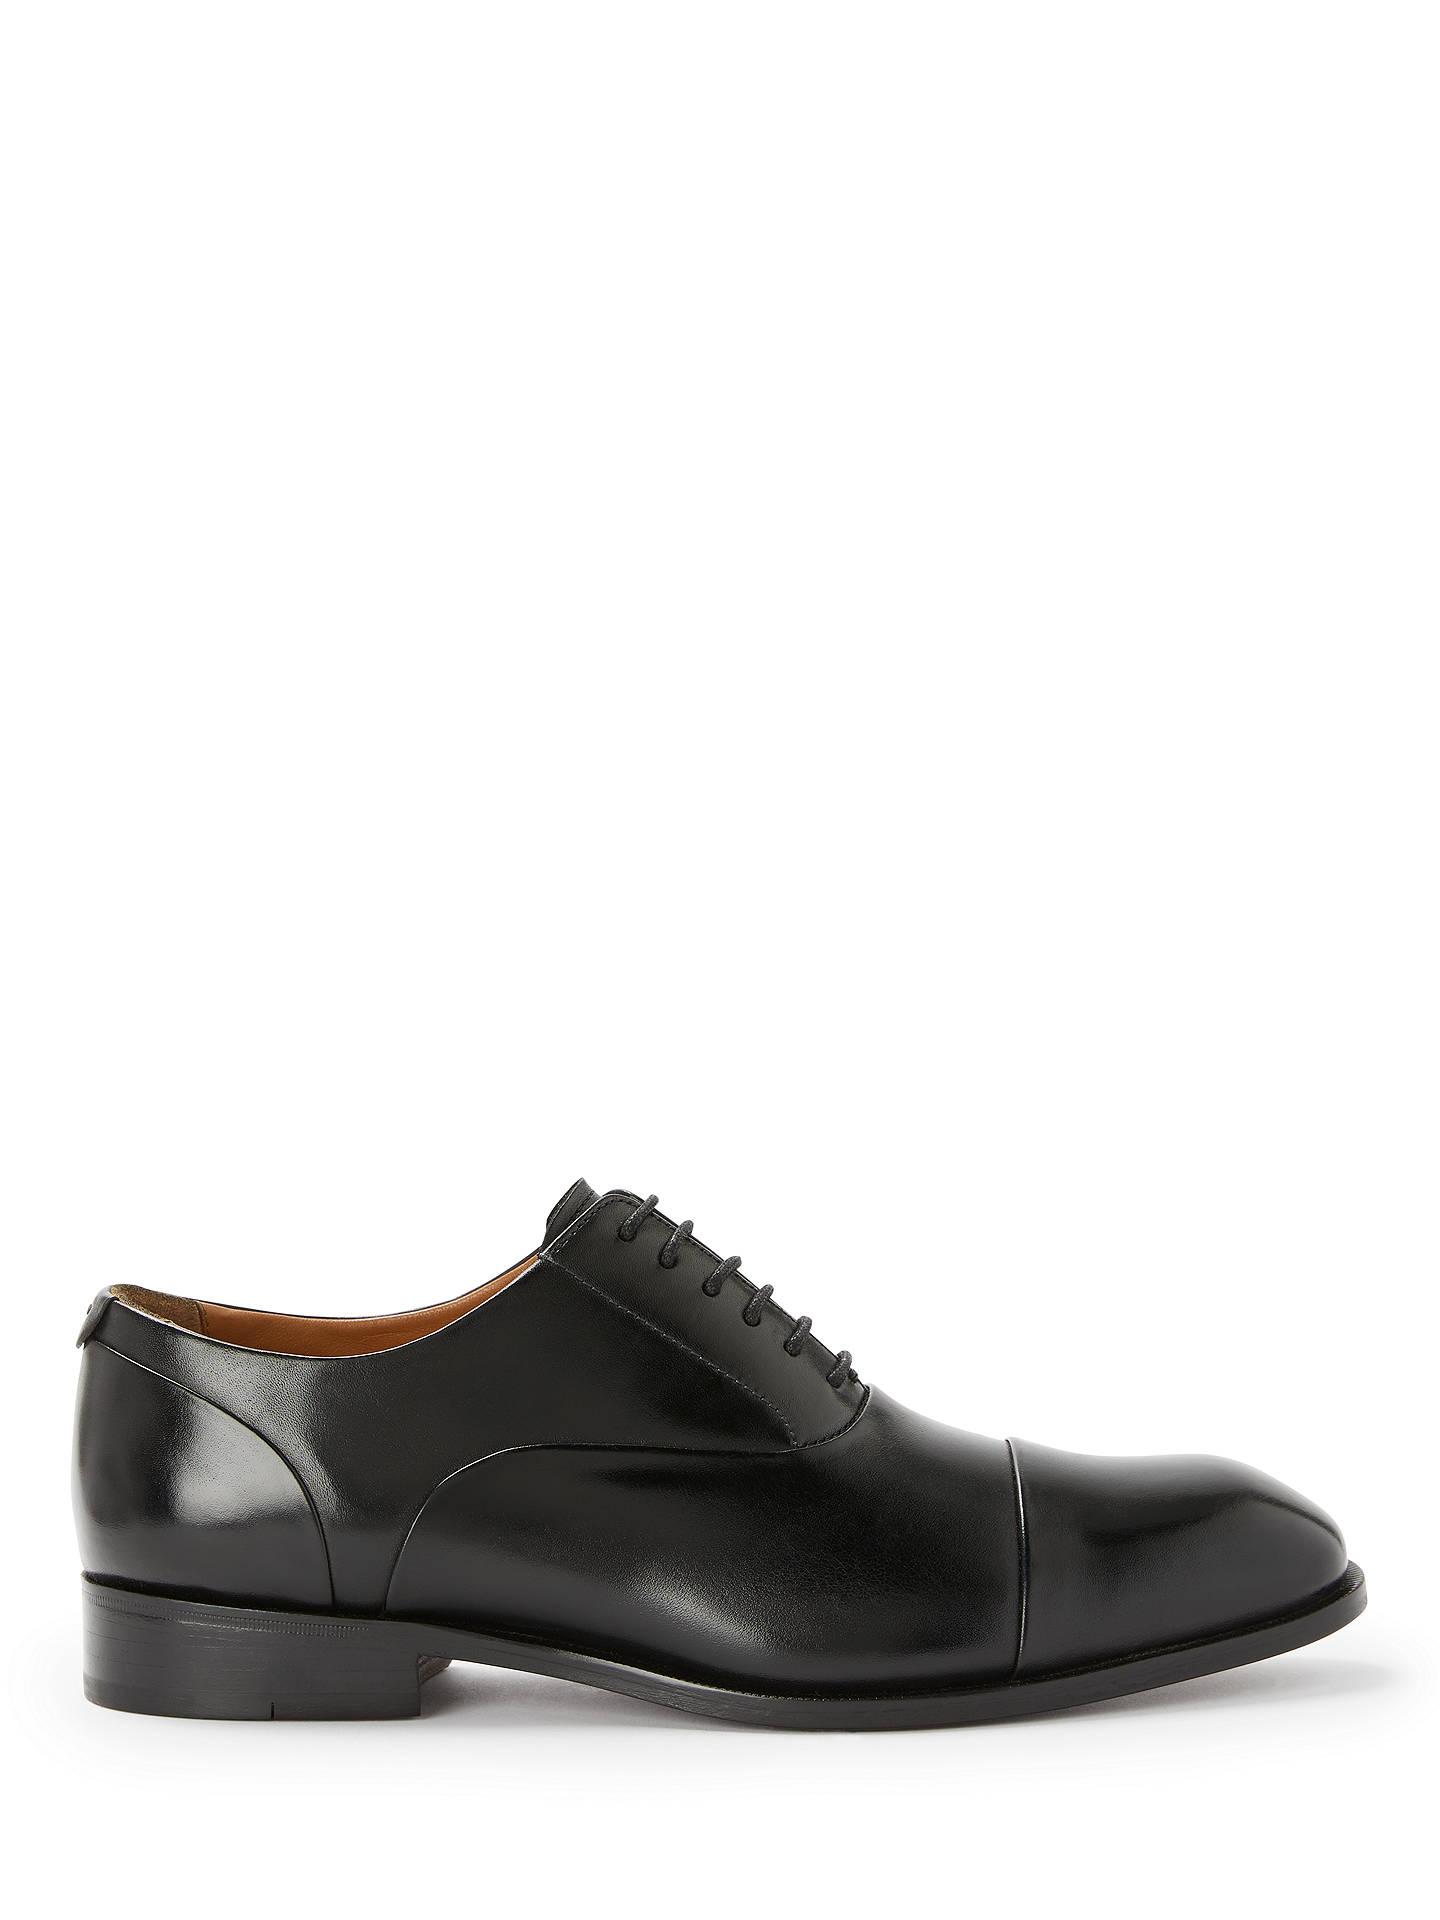 1b9b081679b2 Buy John Lewis   Partners Charles Oxford Shoes